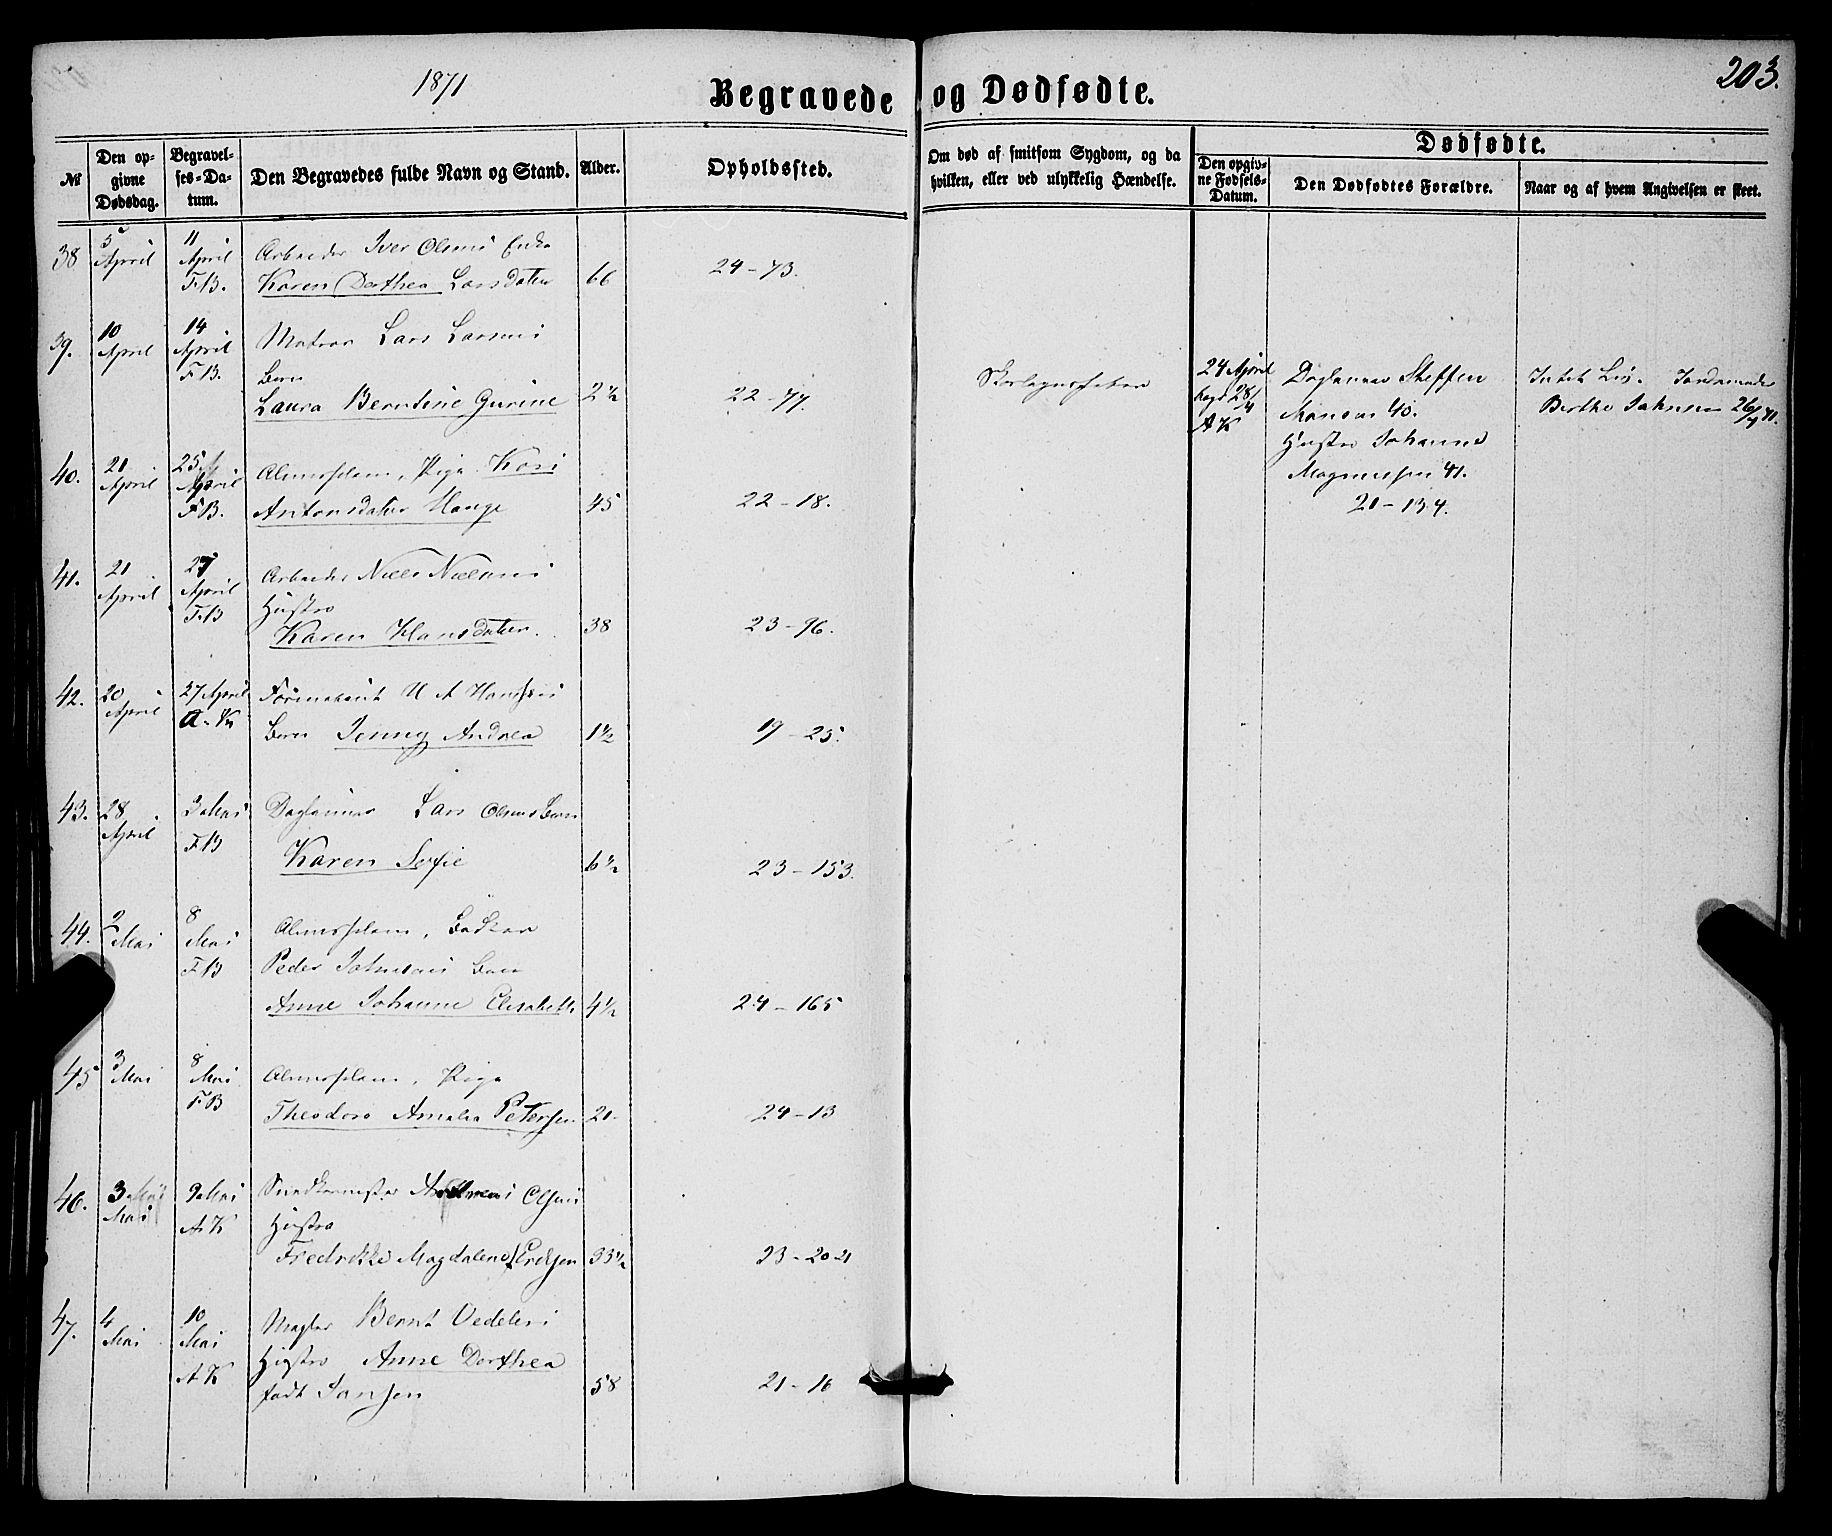 SAB, Korskirken Sokneprestembete, H/Haa/L0045: Ministerialbok nr. E 3, 1863-1875, s. 203